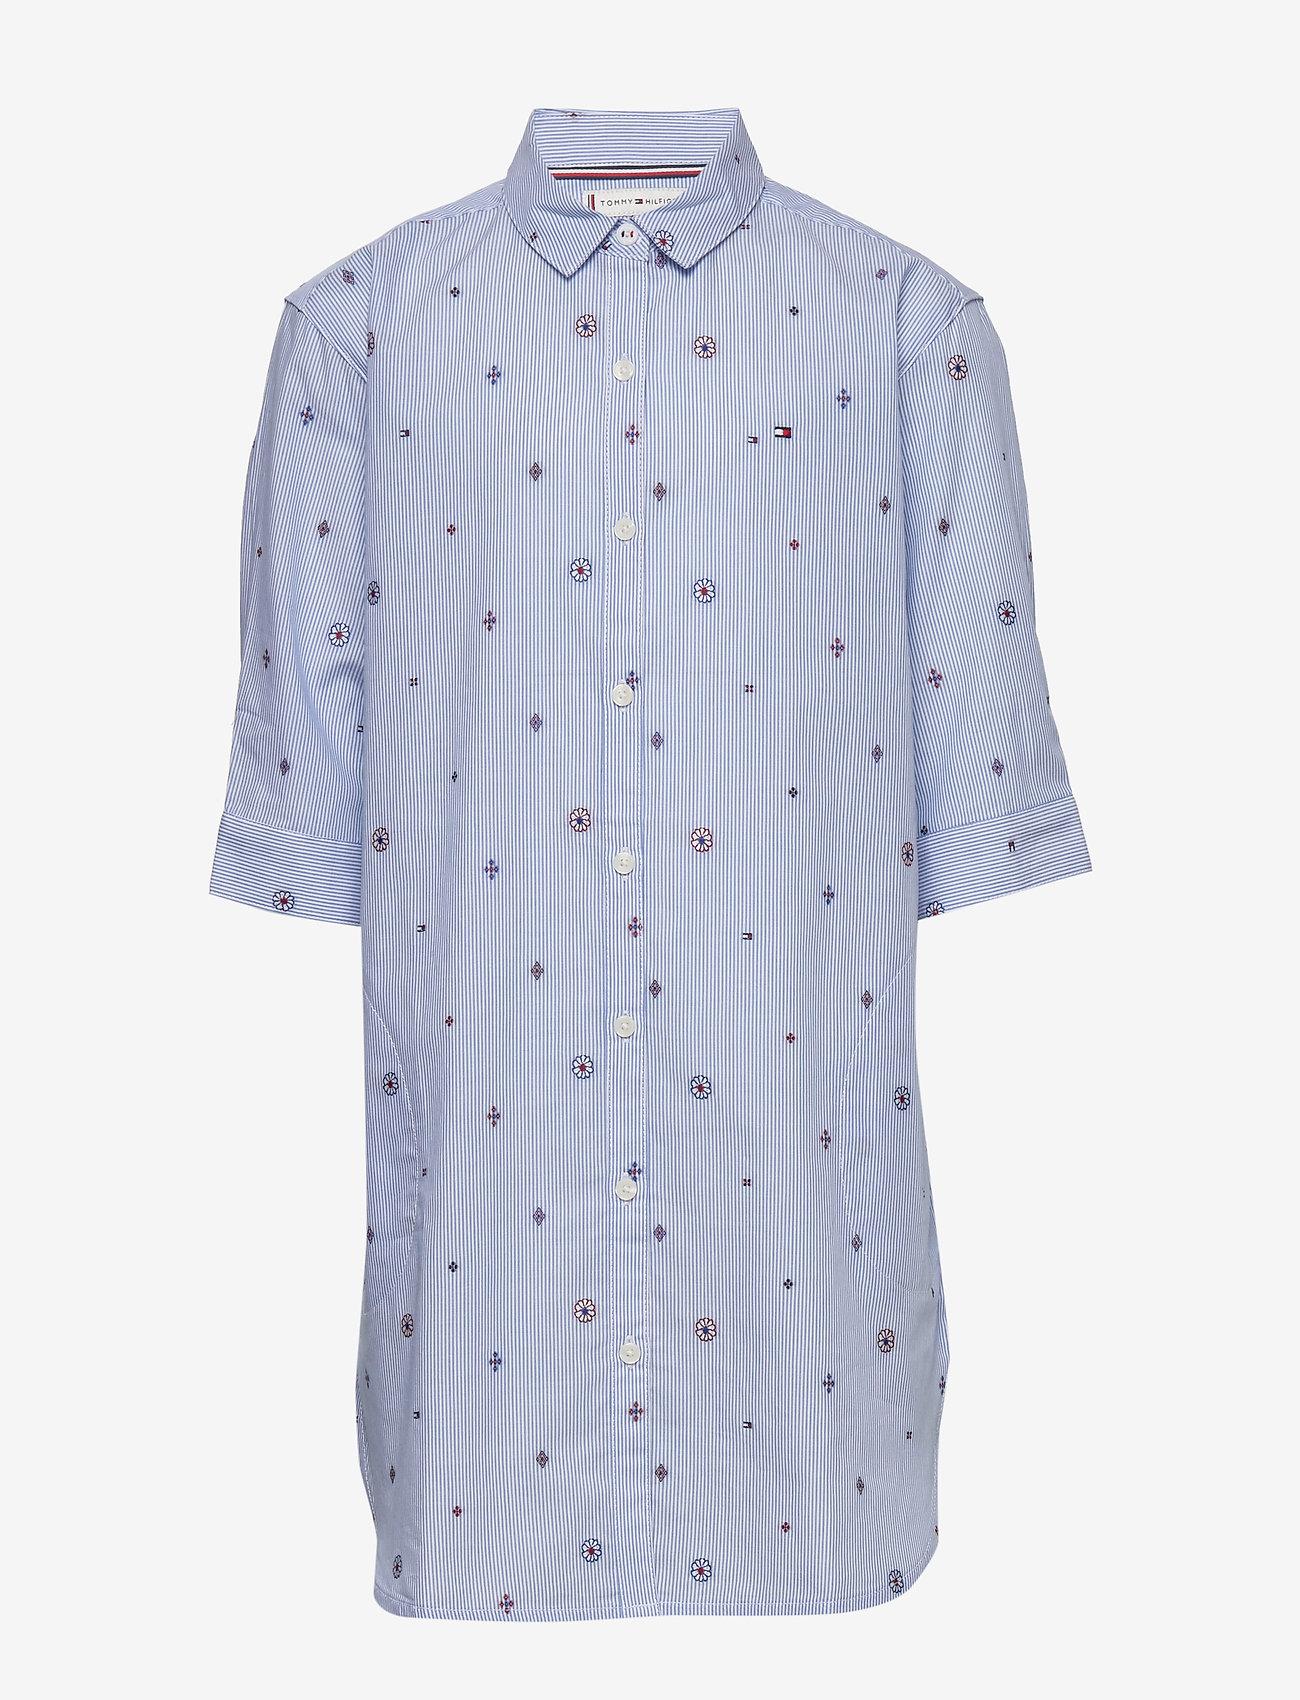 Tommy Hilfiger - LIGHT WOVEN DRESS S/S - robes - calm blue / stripe - 0